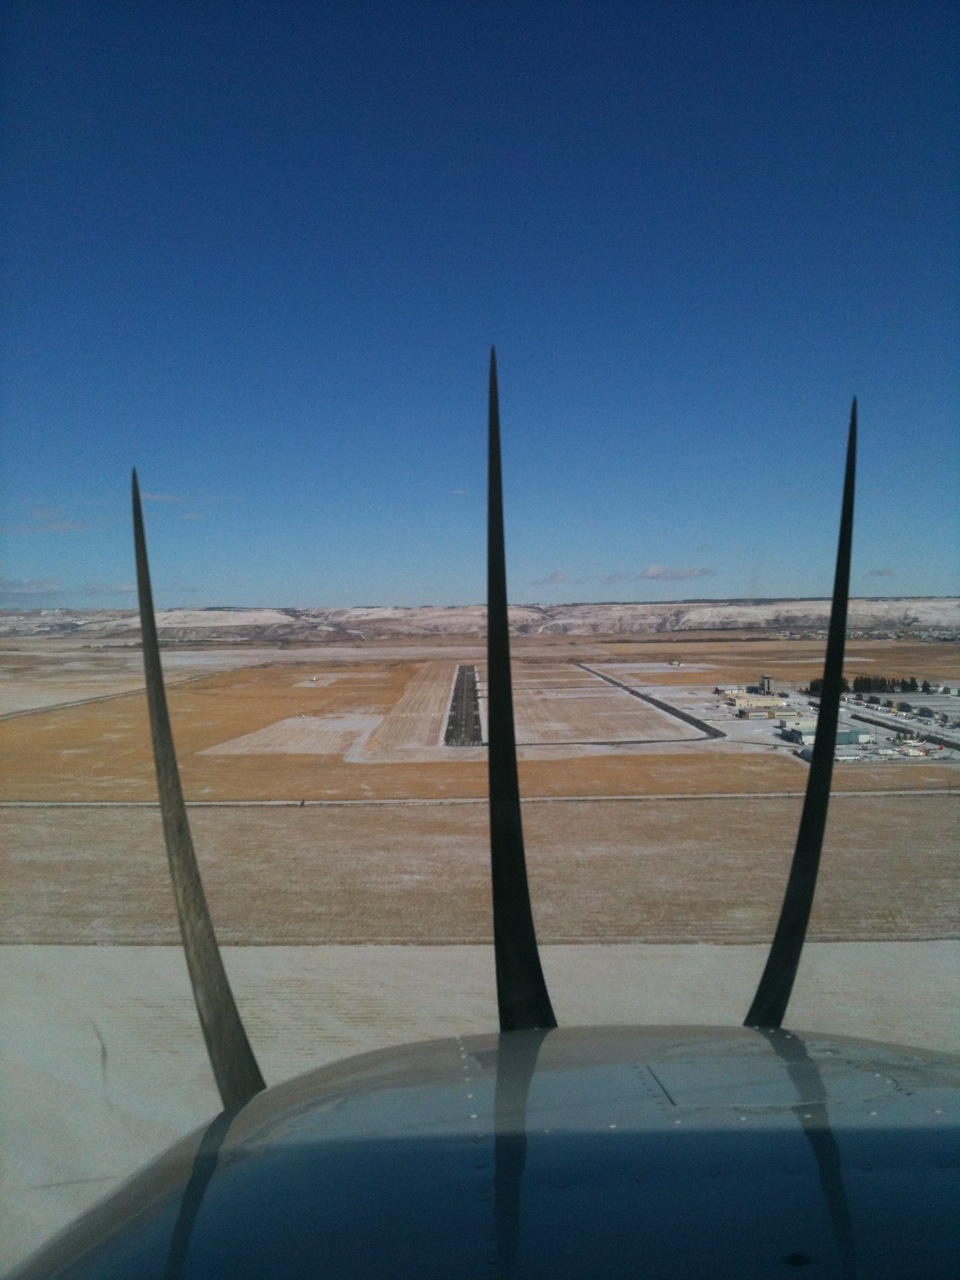 On approach for runway 34, CYBW